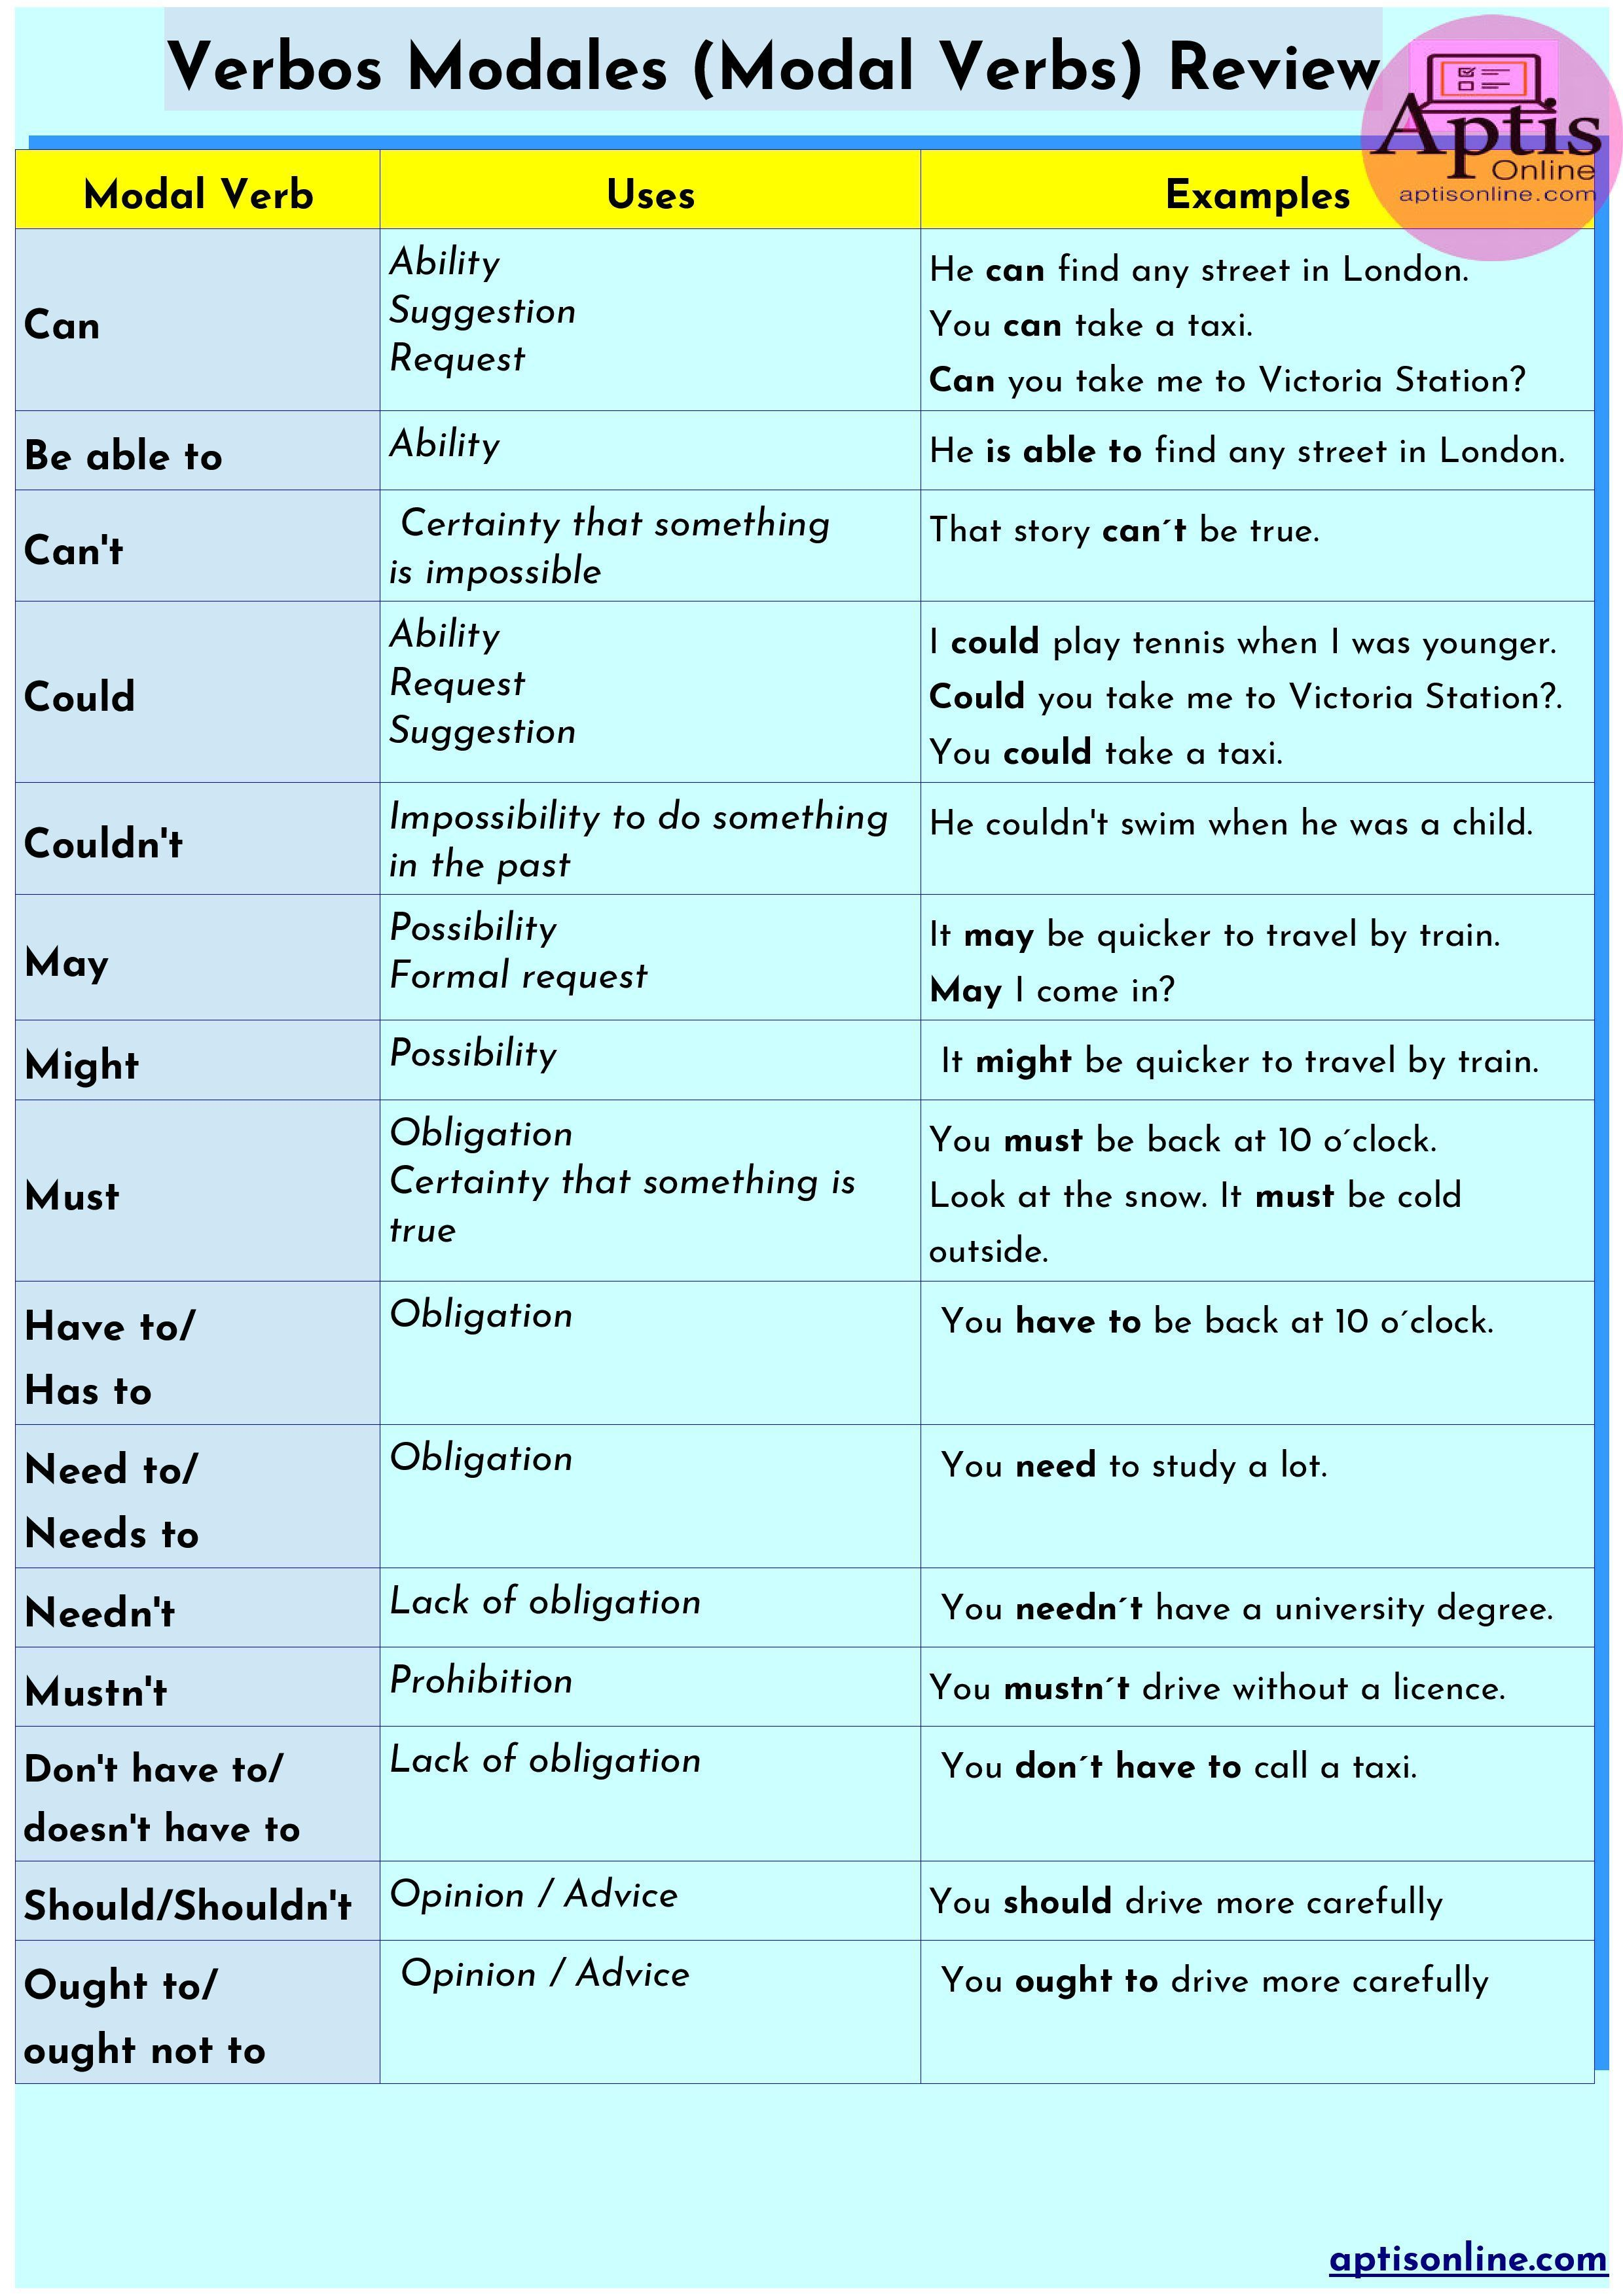 English Model Verbs Model Verbs In English English Verbs English Grammar Learn English [ 3508 x 2479 Pixel ]